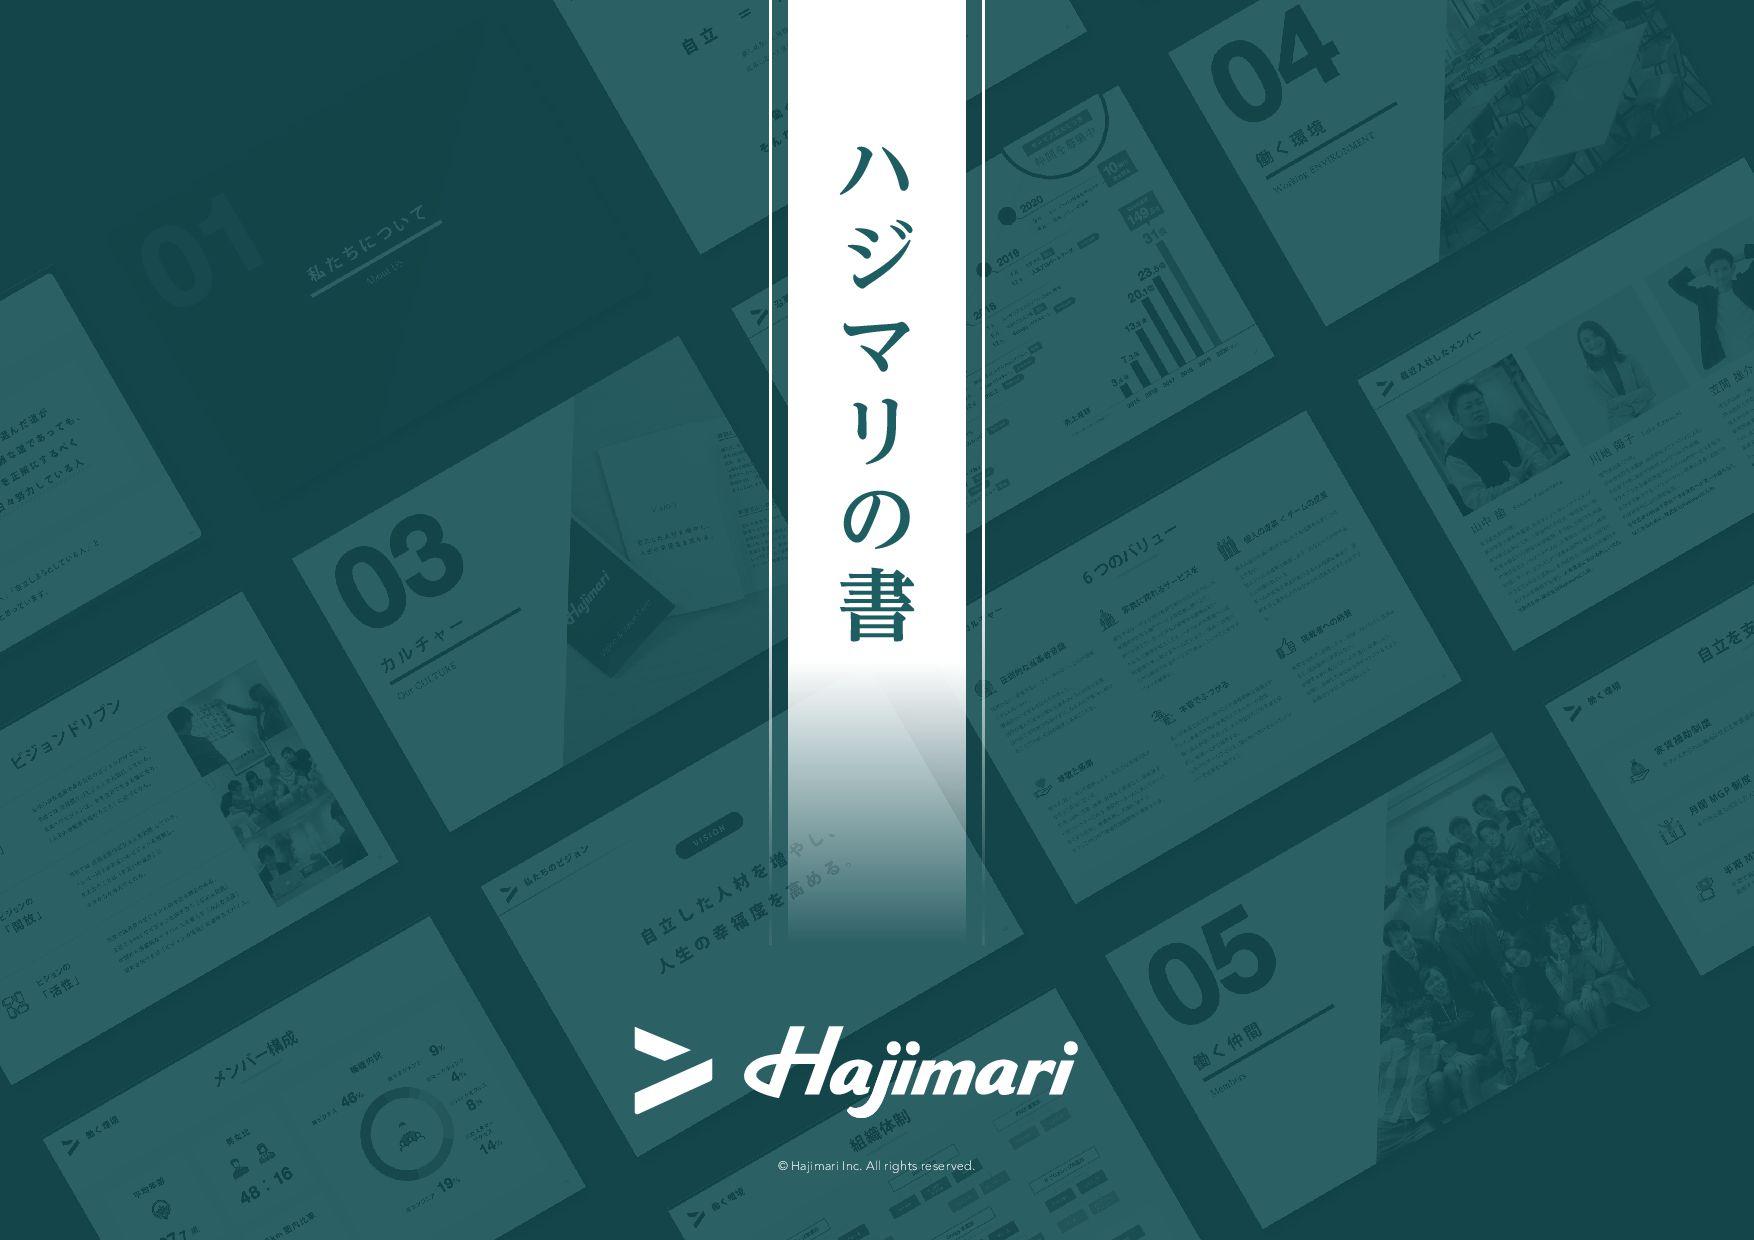 © Hajimari Inc. All rights reserved. ϋ δ Ϛ Ϧ ͷ ॻ